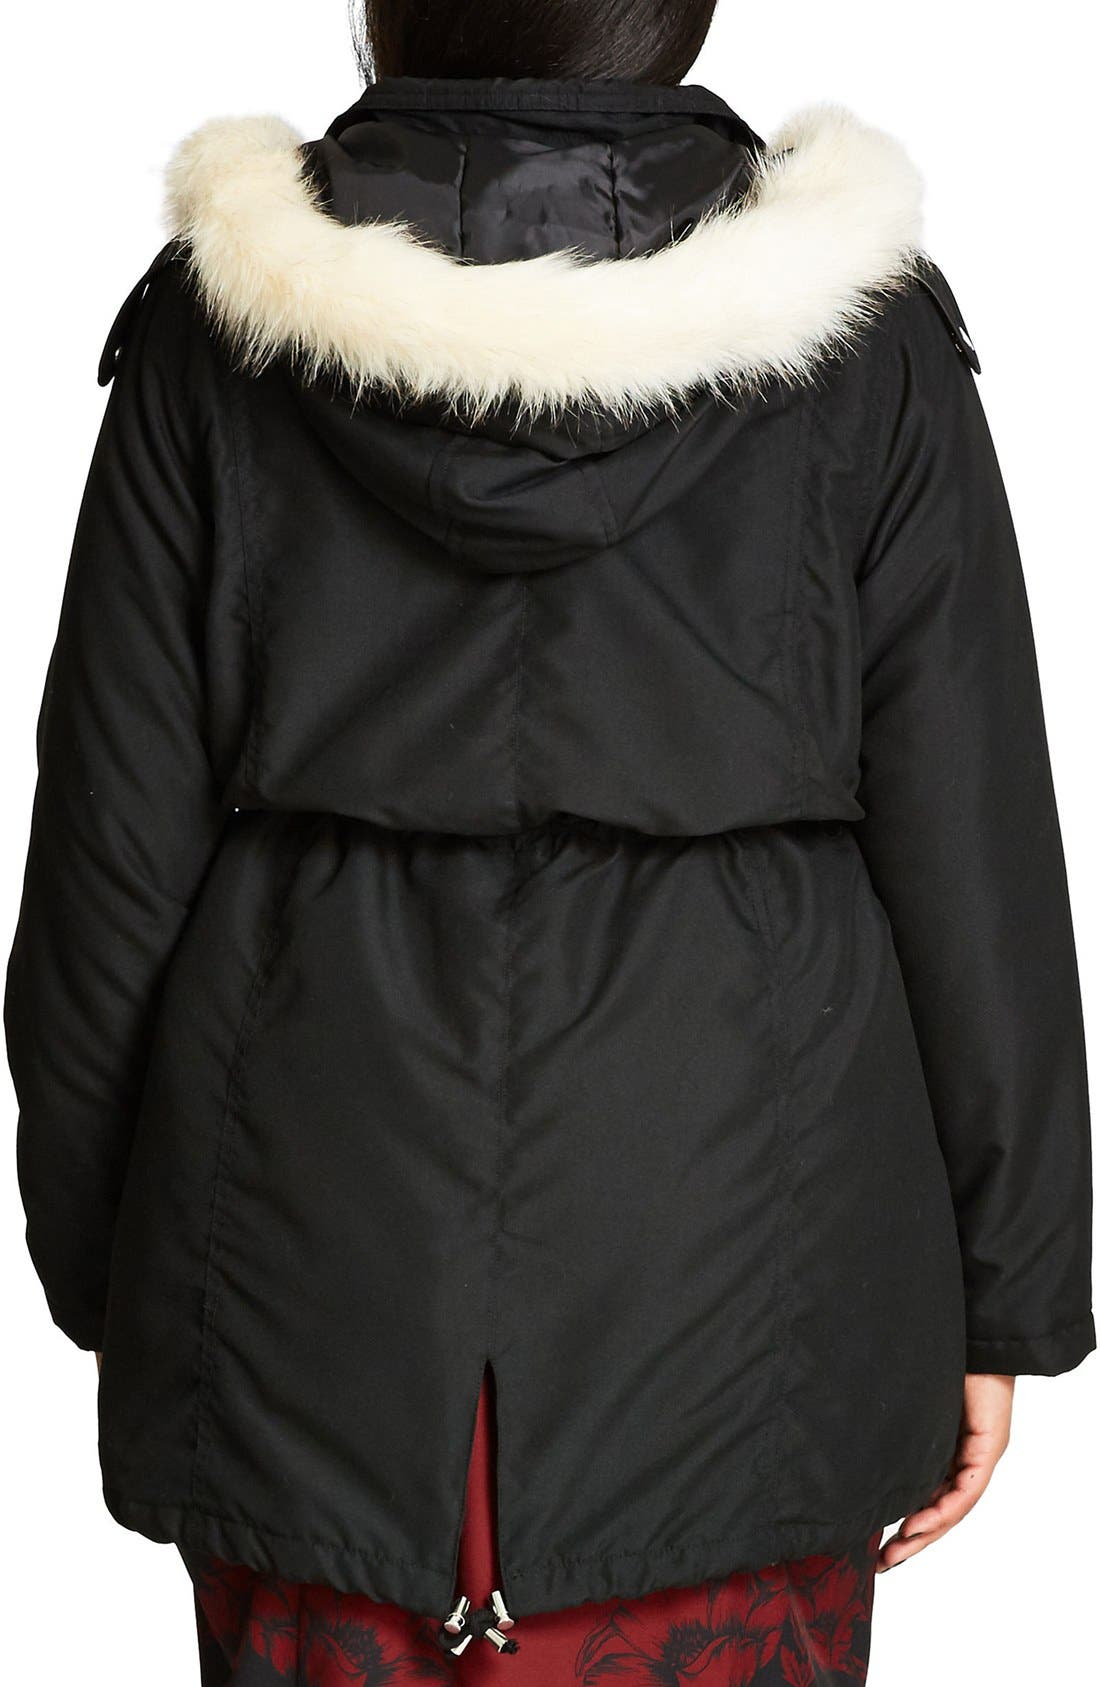 'London Look' Faux Fur Trim Hooded Parka,                             Alternate thumbnail 4, color,